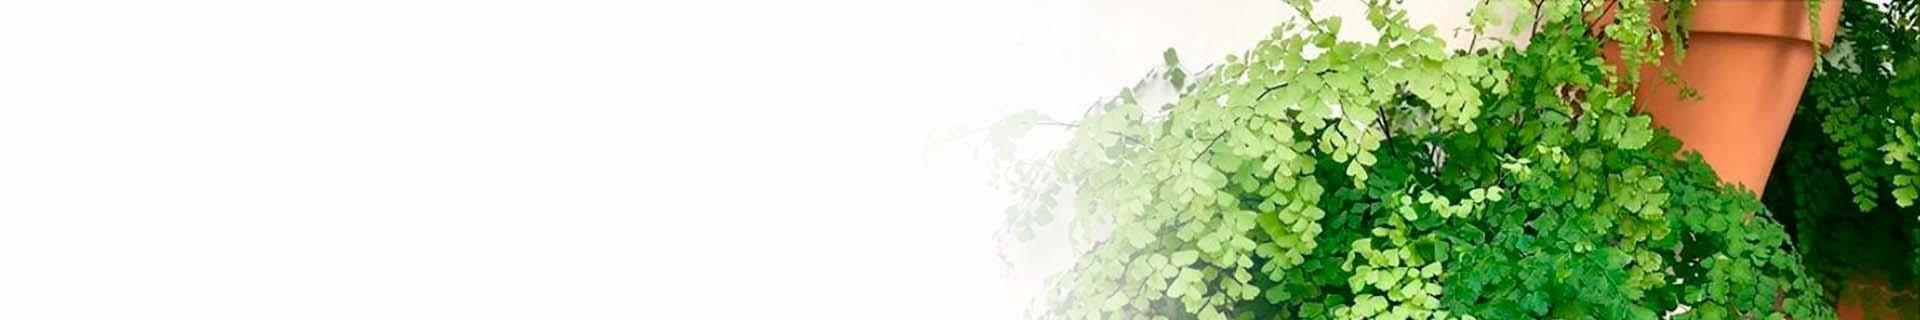 Subscription of new plants every season | CitySens